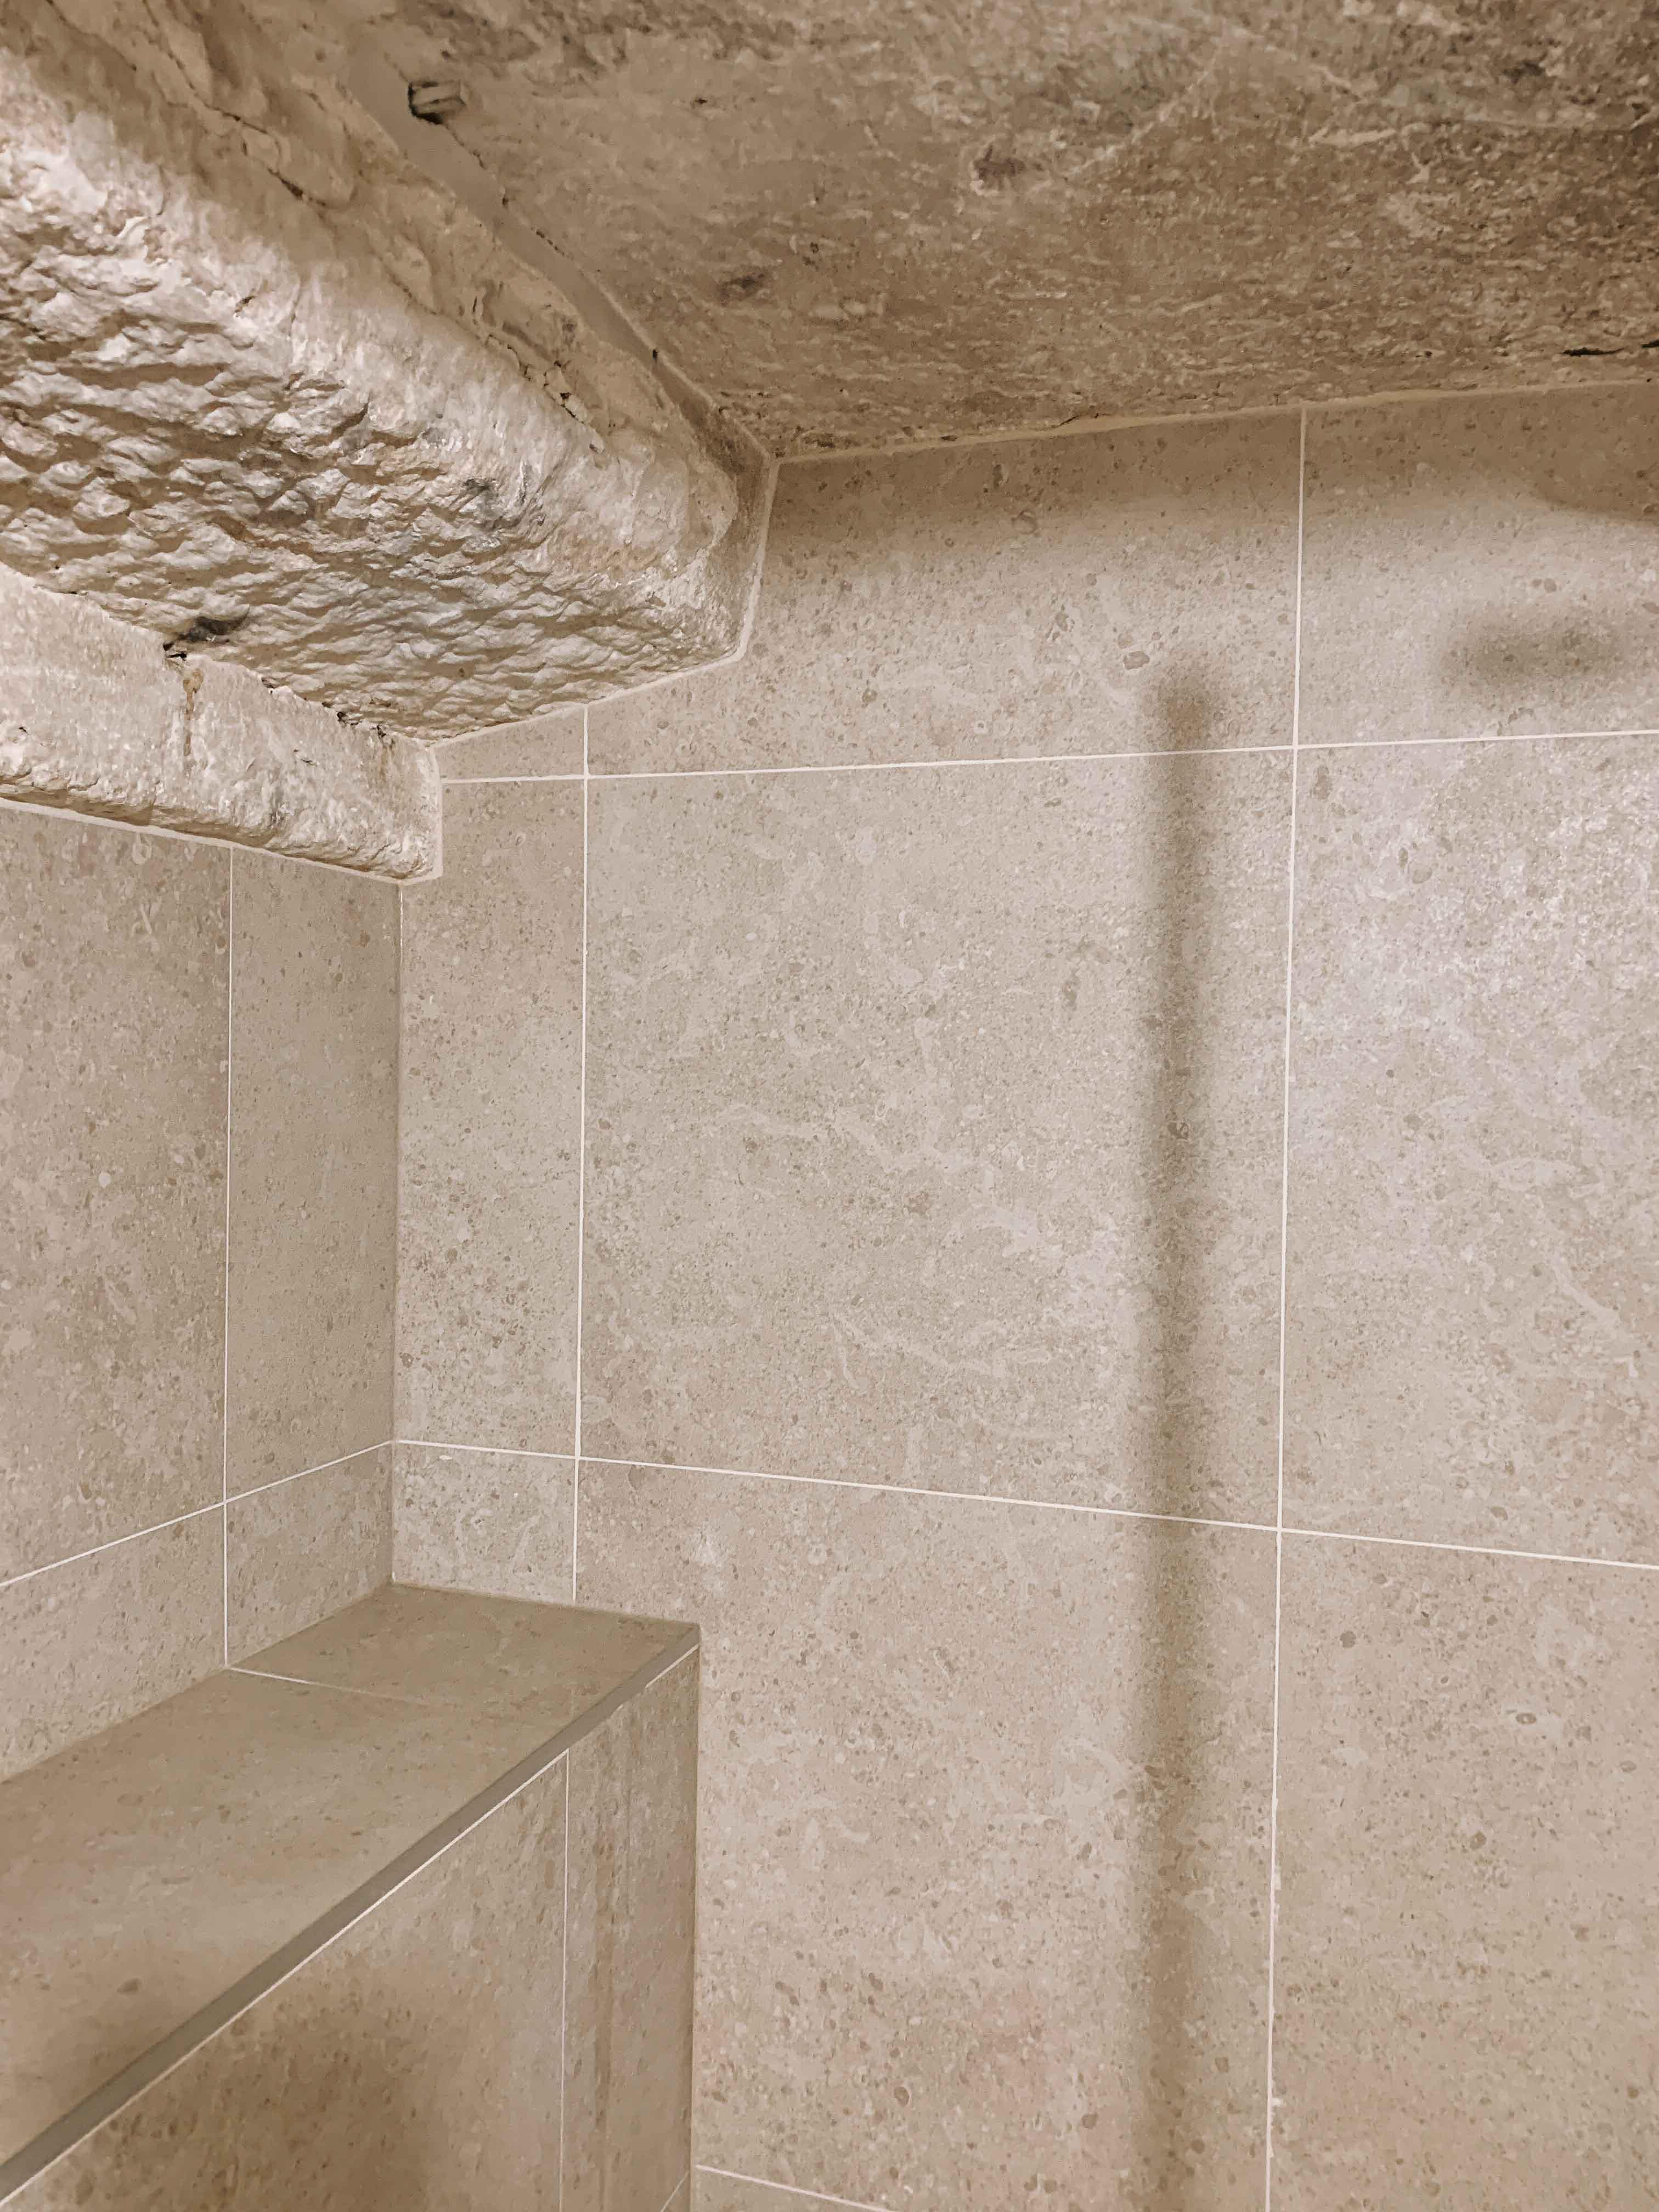 architecte-lyon-rénovation-presbytere-marcilly-azergues-pierre-dorée-28